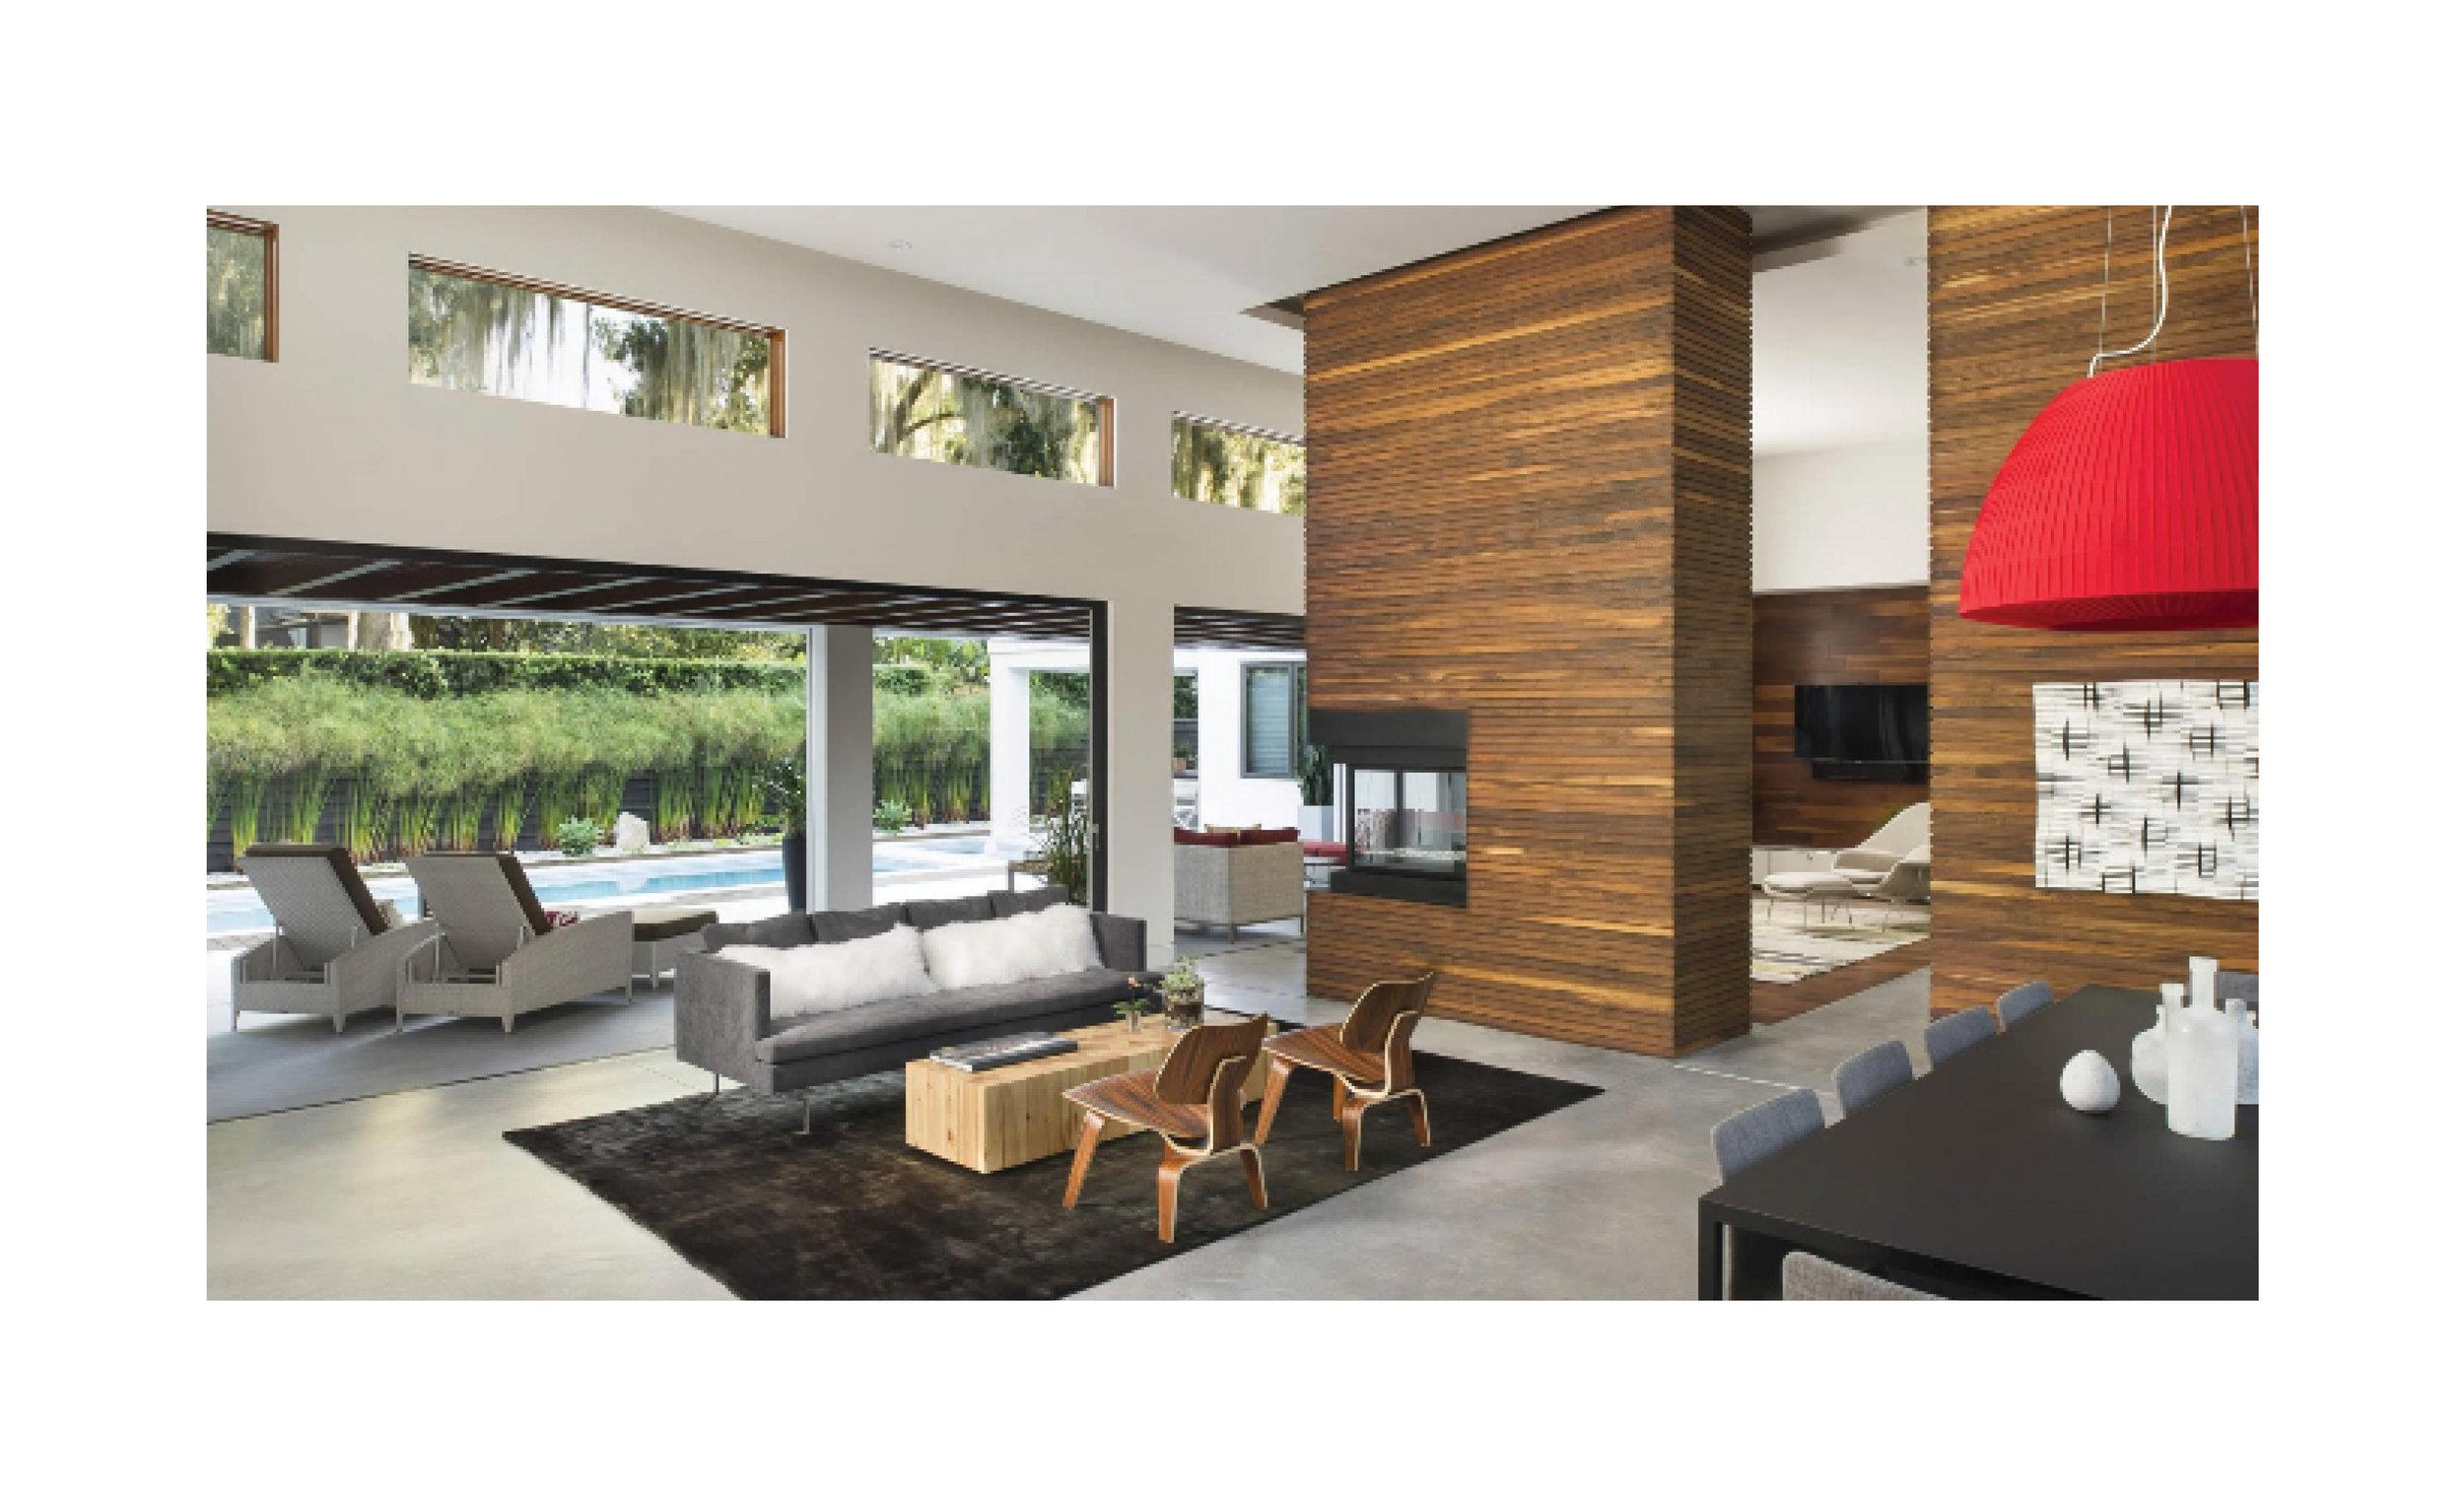 New View Mock-Up Interior_Phil Kean4.jpg